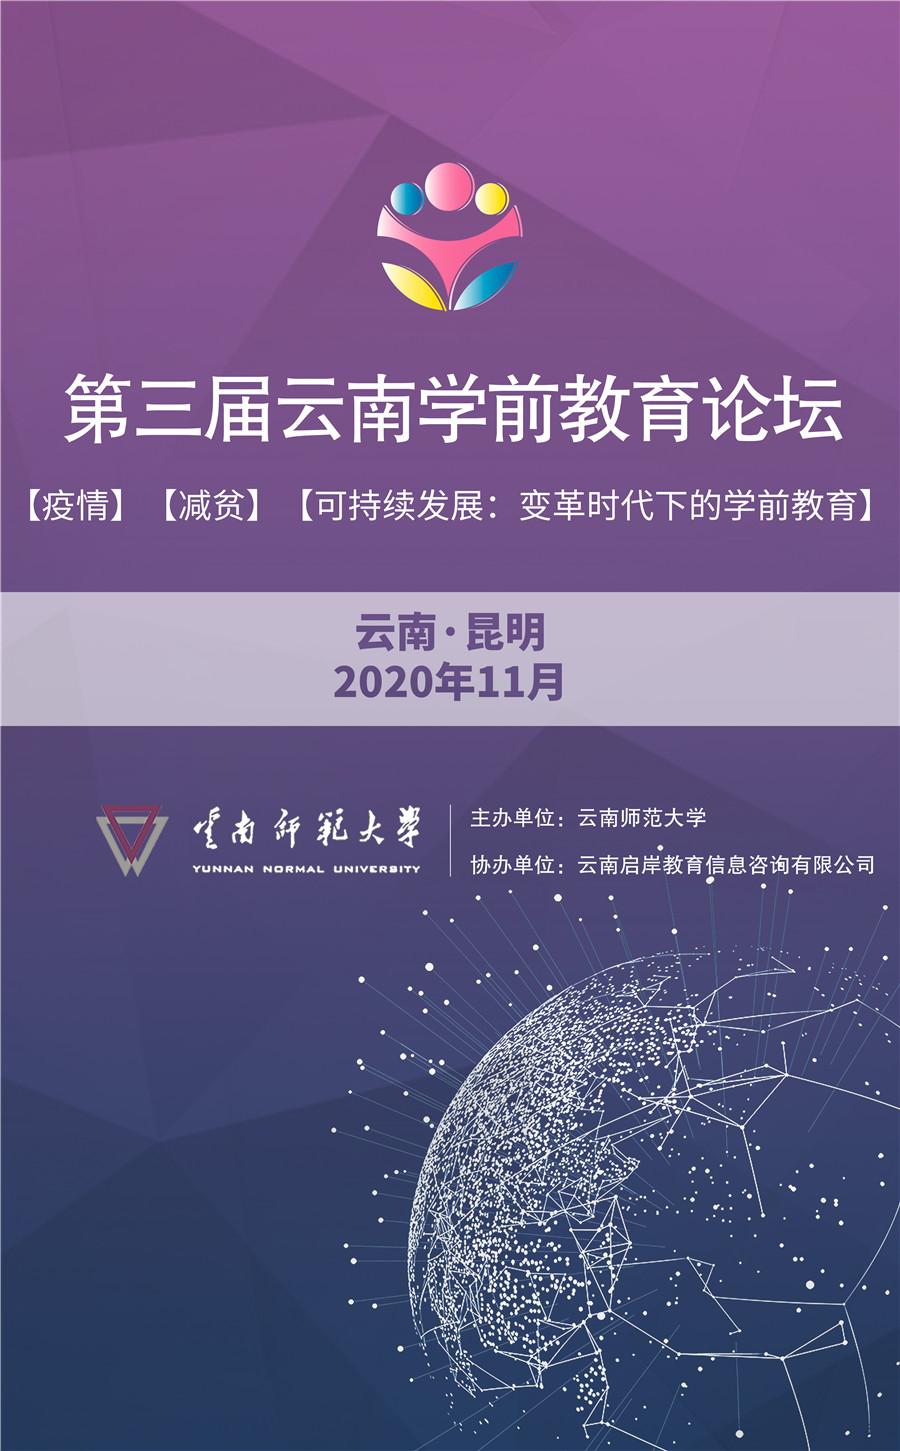 http://www.liuyubo.com/shehui/3568548.html